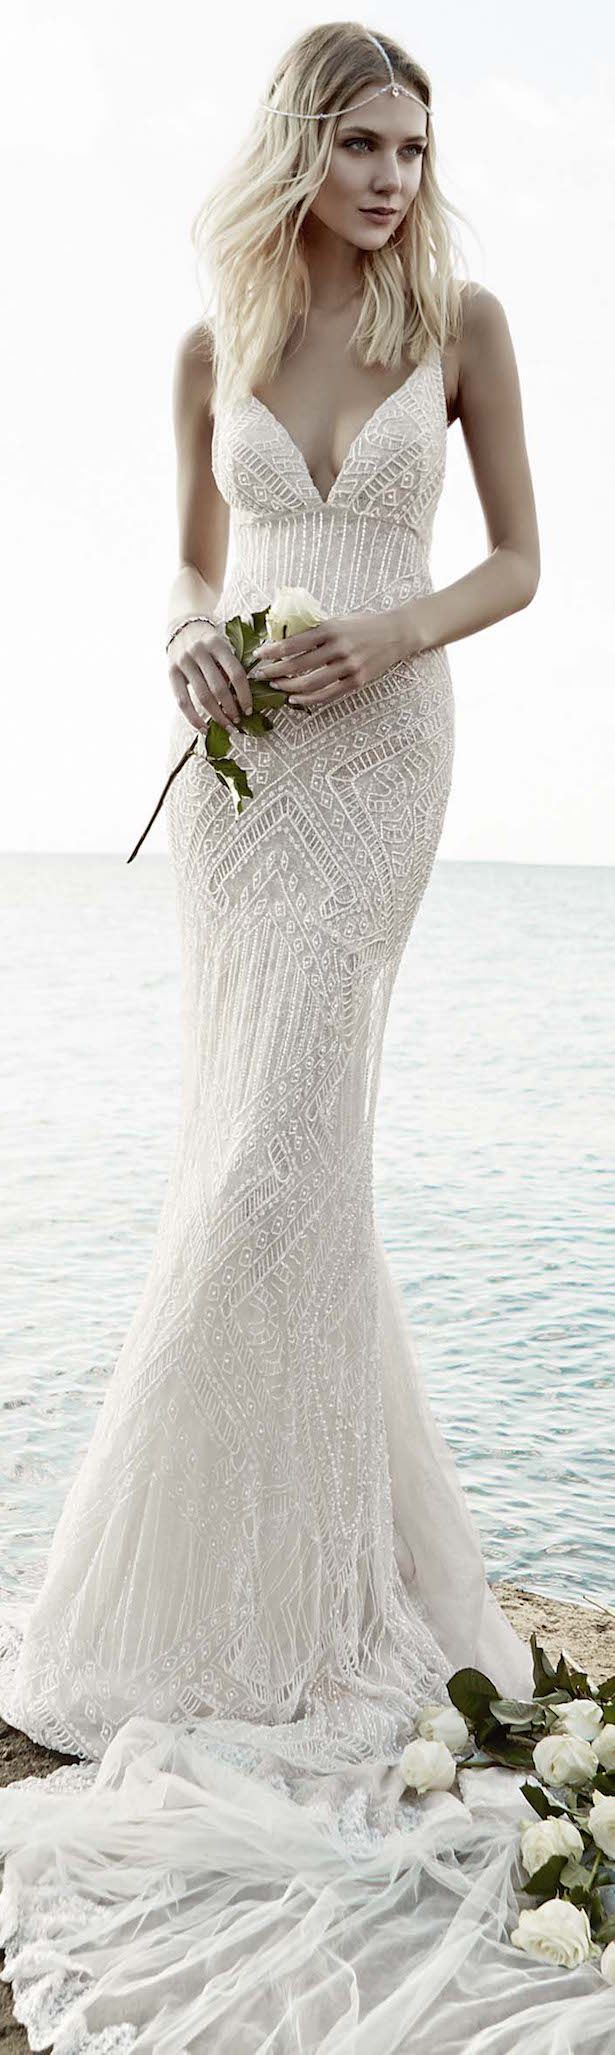 bohemian beach wedding cheap beach wedding dresses Victoria KyriaKides Bridal Fall Floral Constellations Vintage Lace Wedding DressesBeach